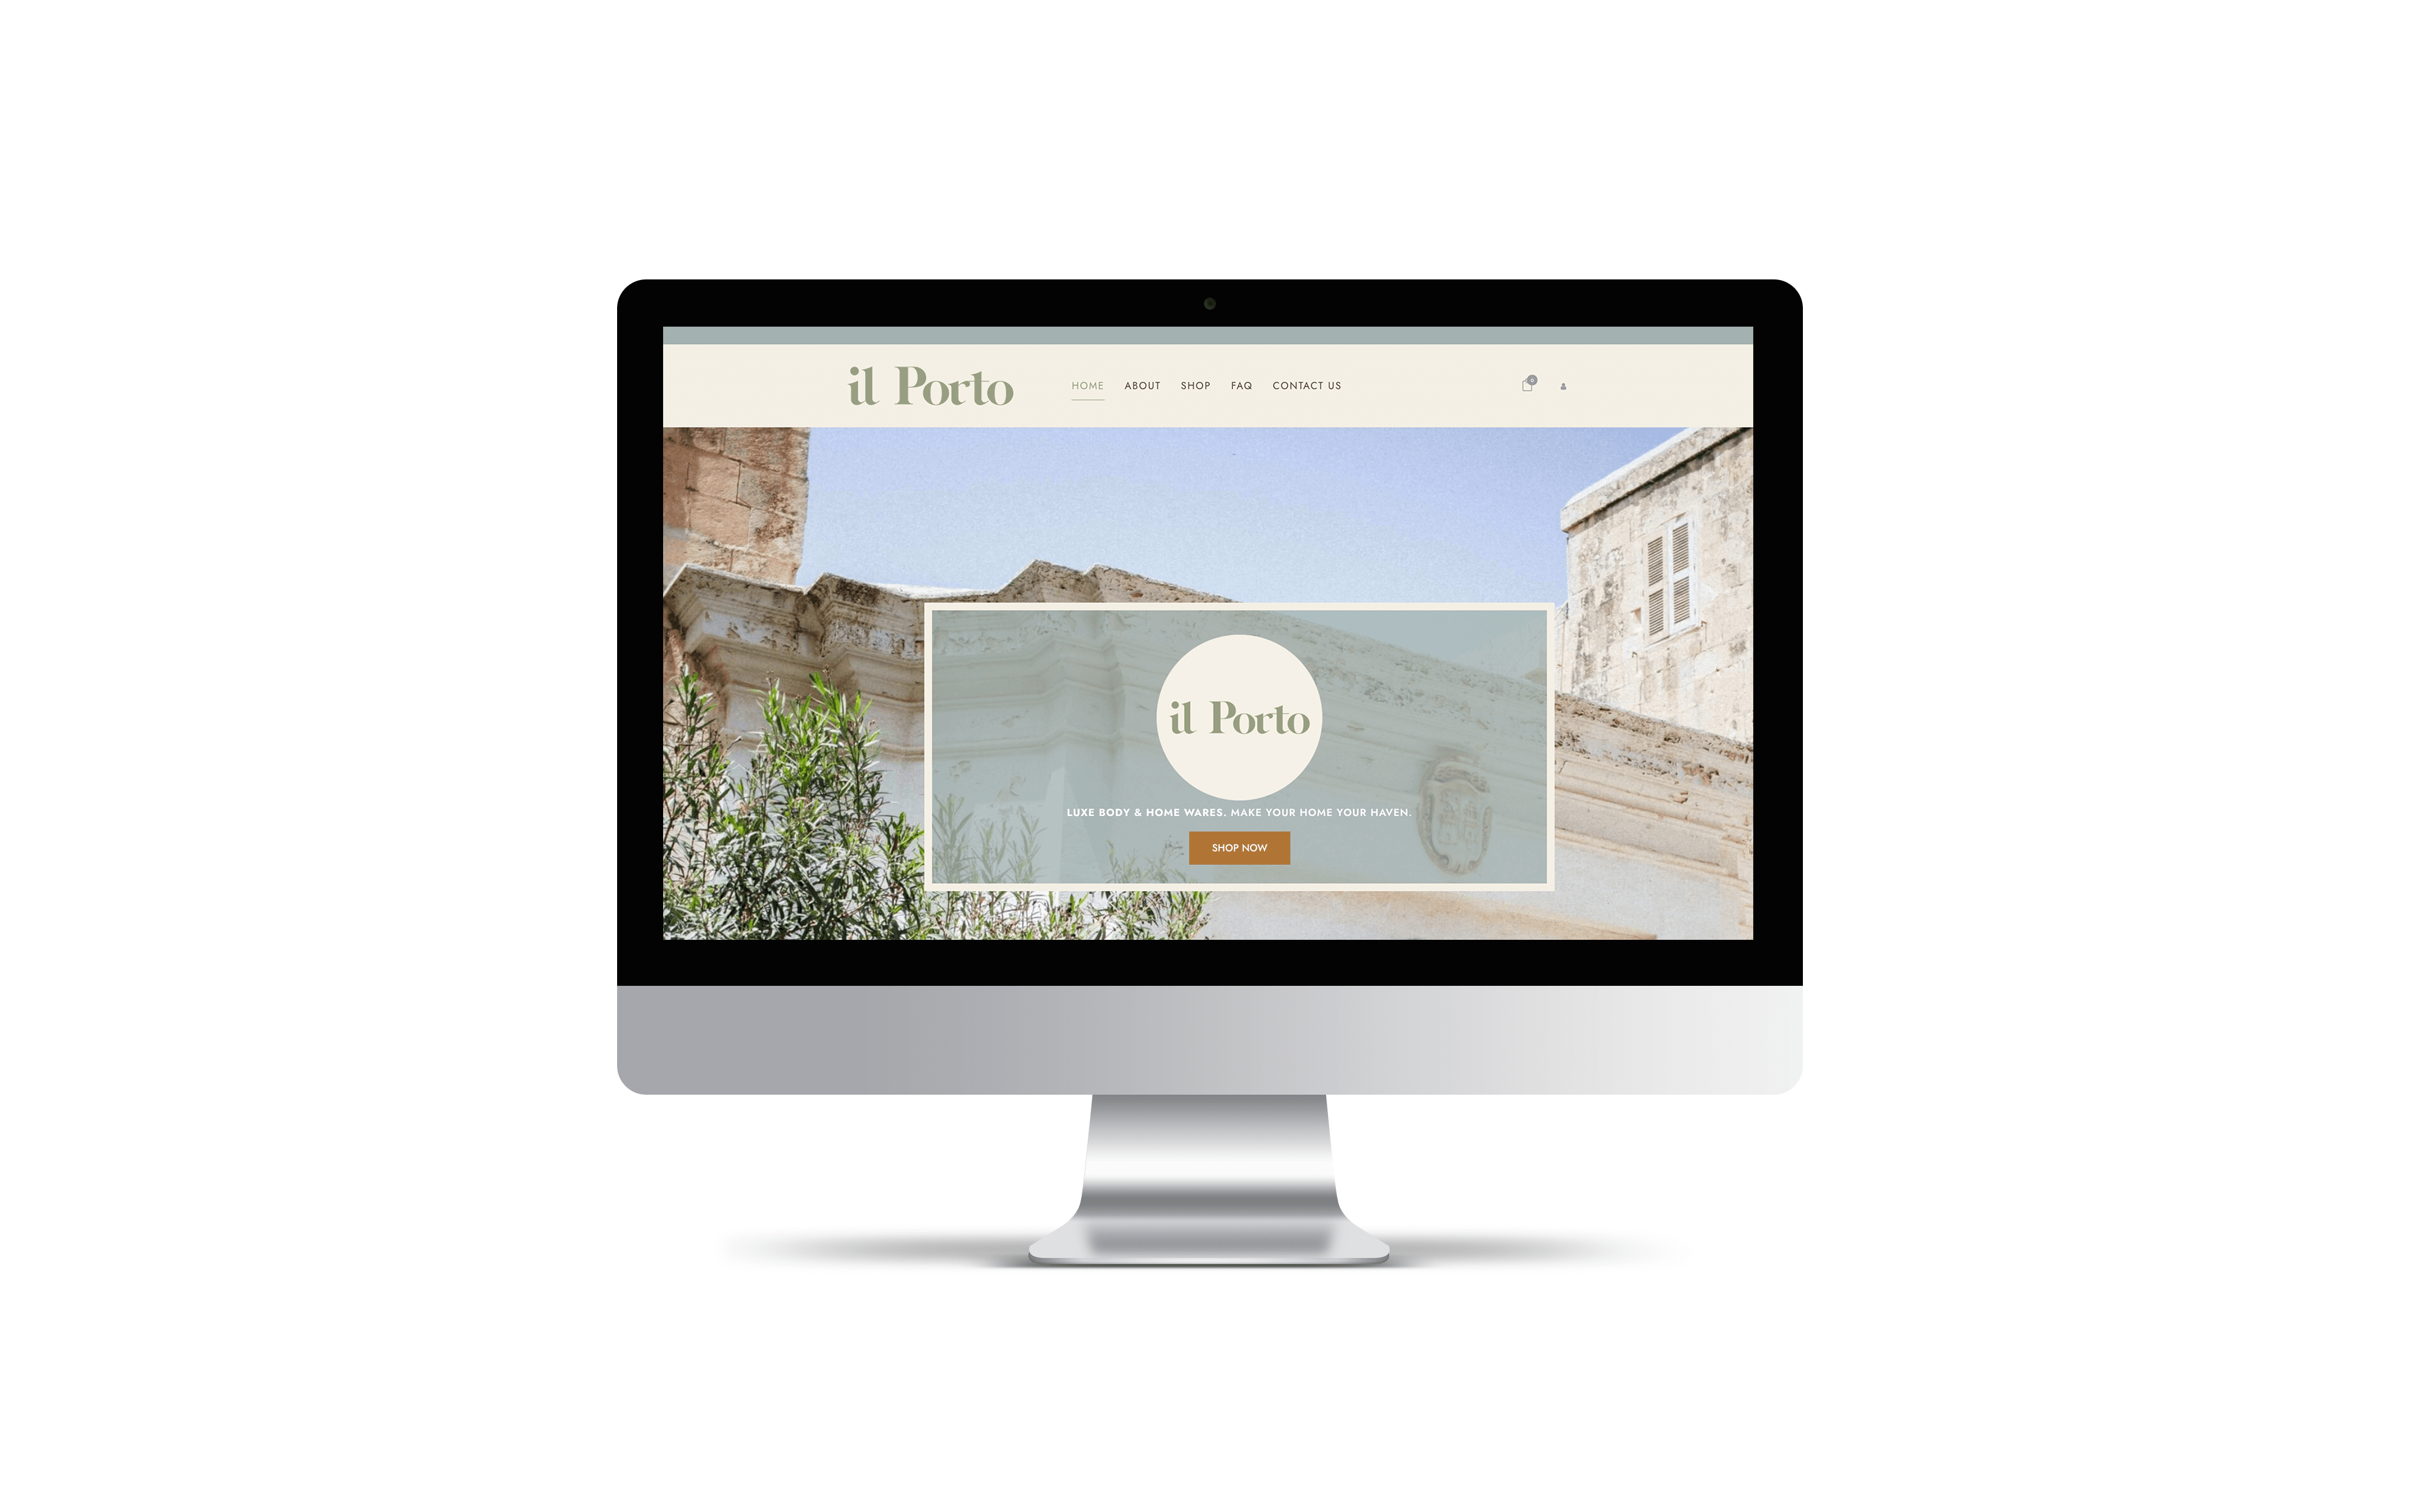 Website: IlPorto